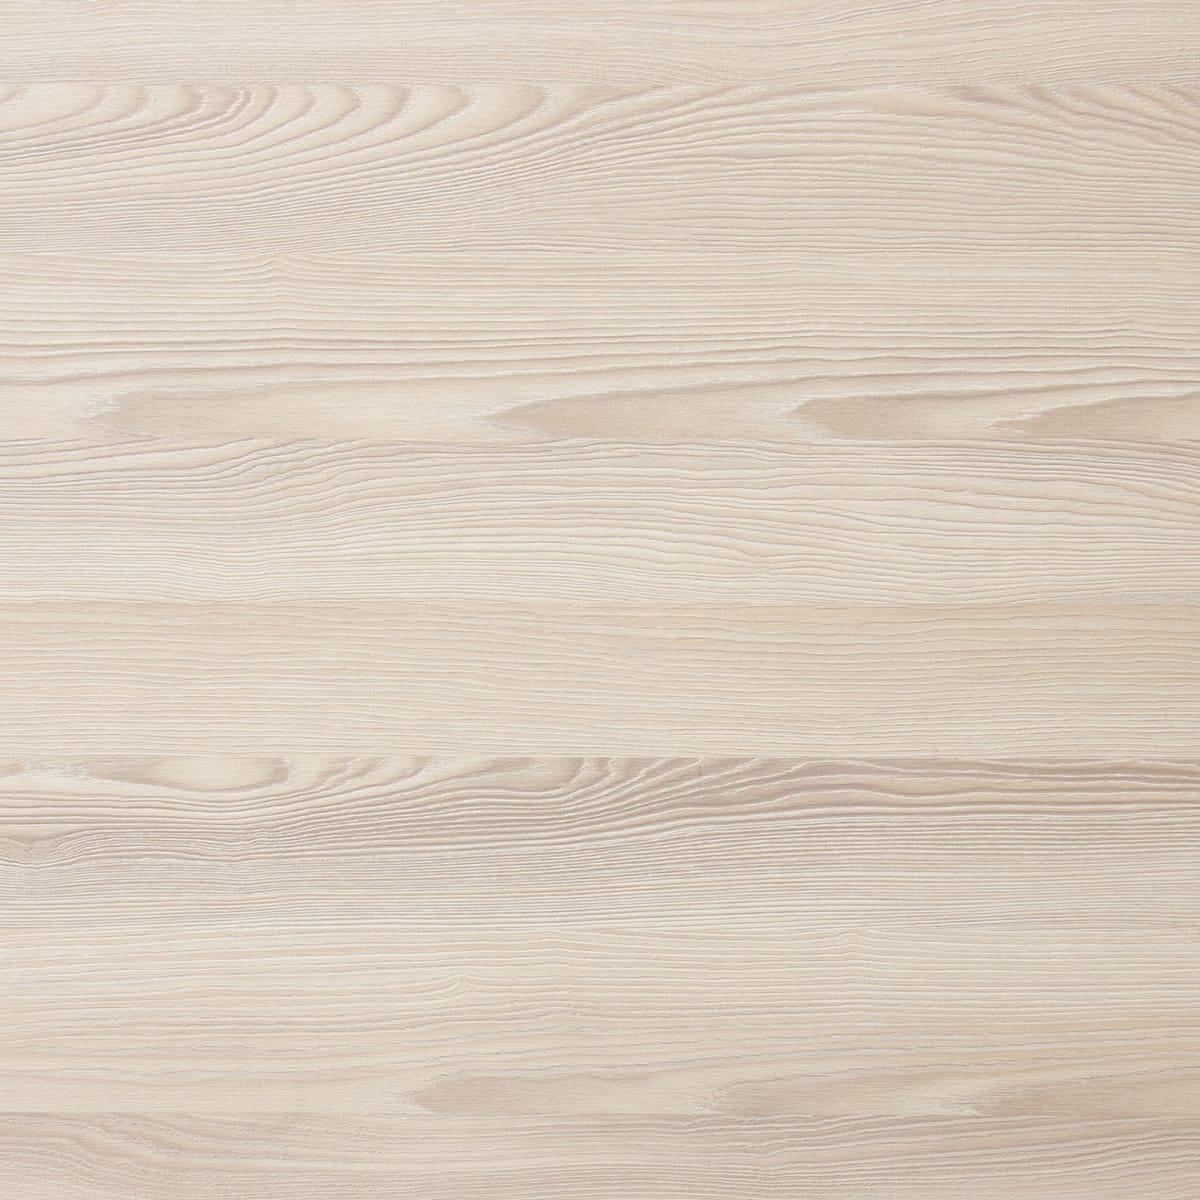 Стеновая панель «Нордик», 240х0.6х65 см, ДСП, цвет бежевый